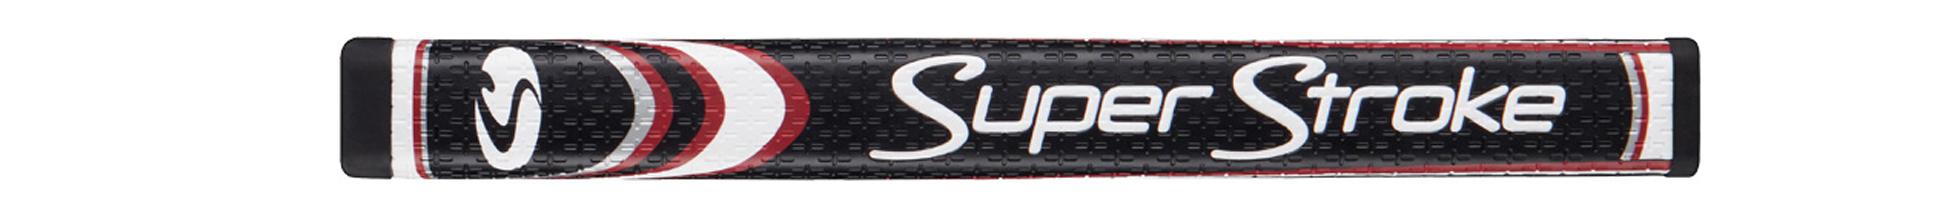 SuperStroke GT 1.0